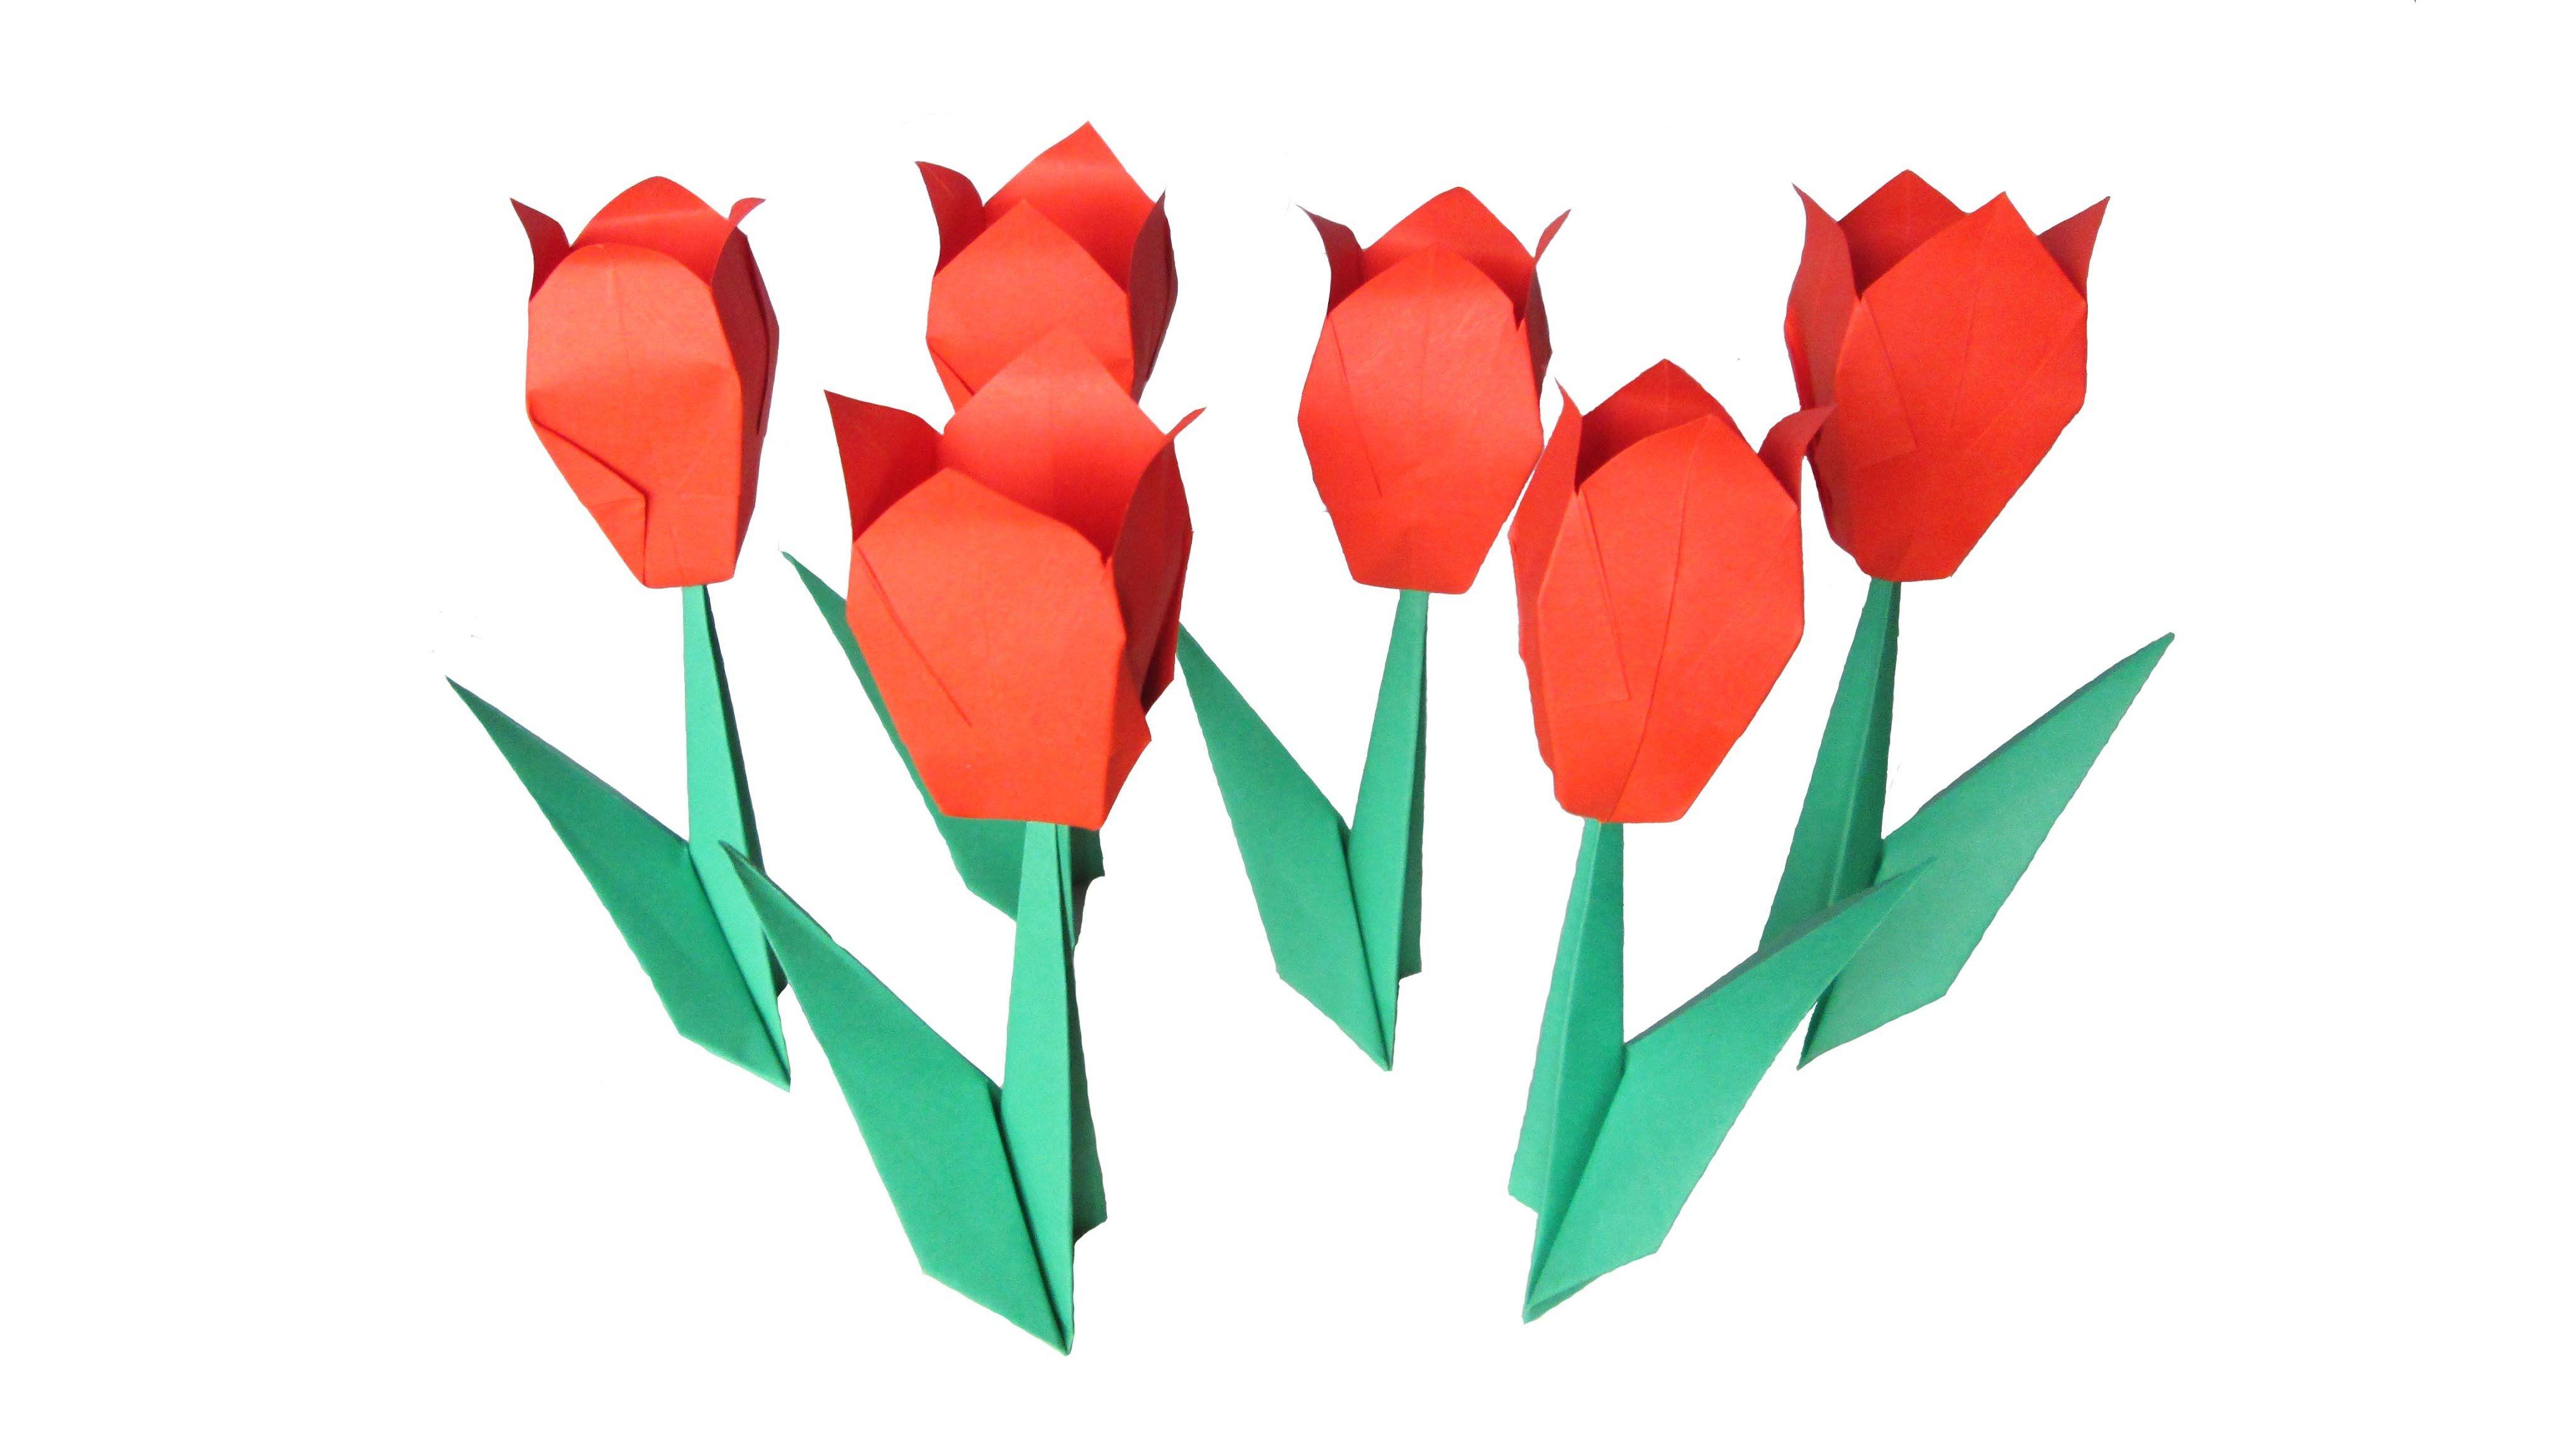 Origami flower tulip pinterest origami kevin macleod origami flower tulip mightylinksfo